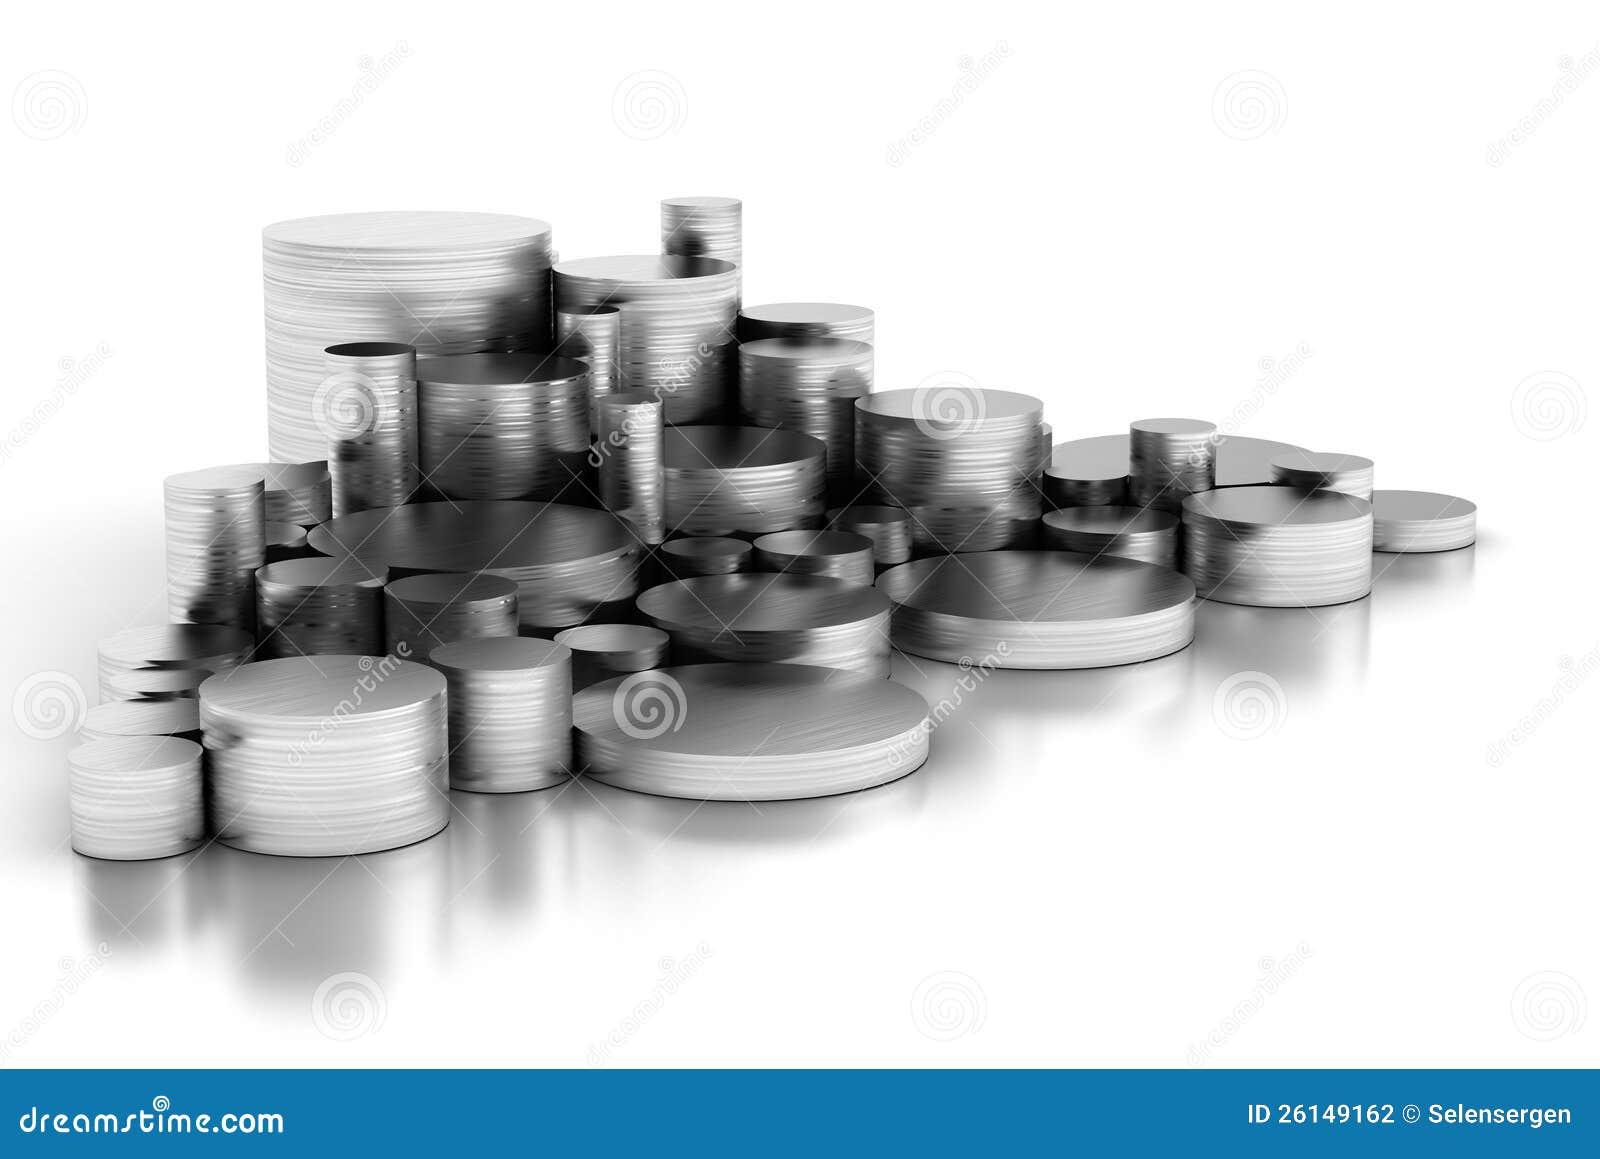 Pile de pipes en acier